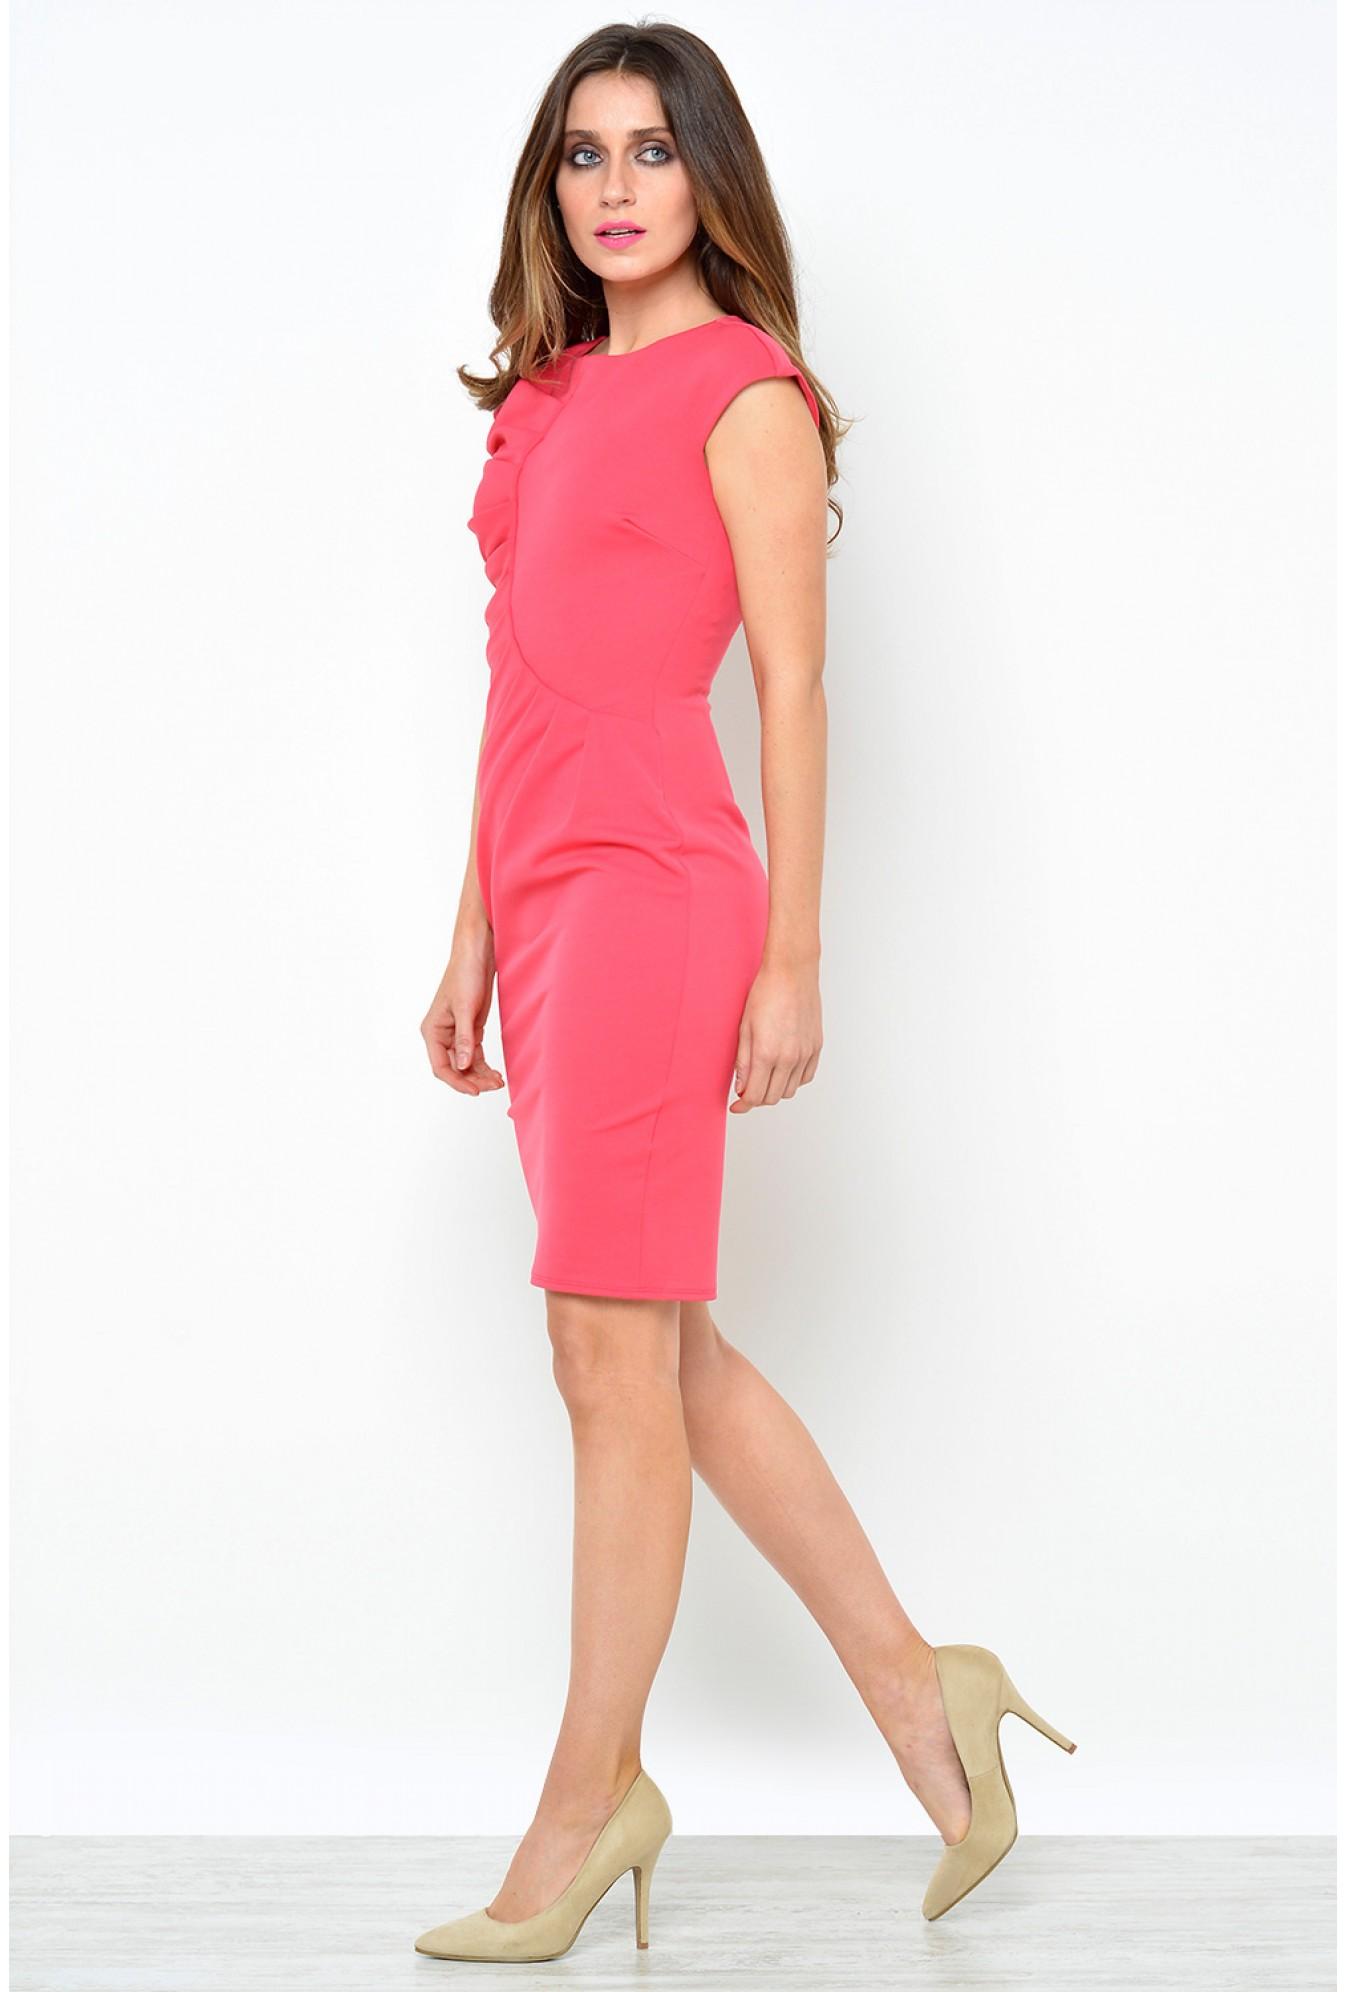 Goddiva Jaden Pleated Midi Dress in Coral  62ddf78bd